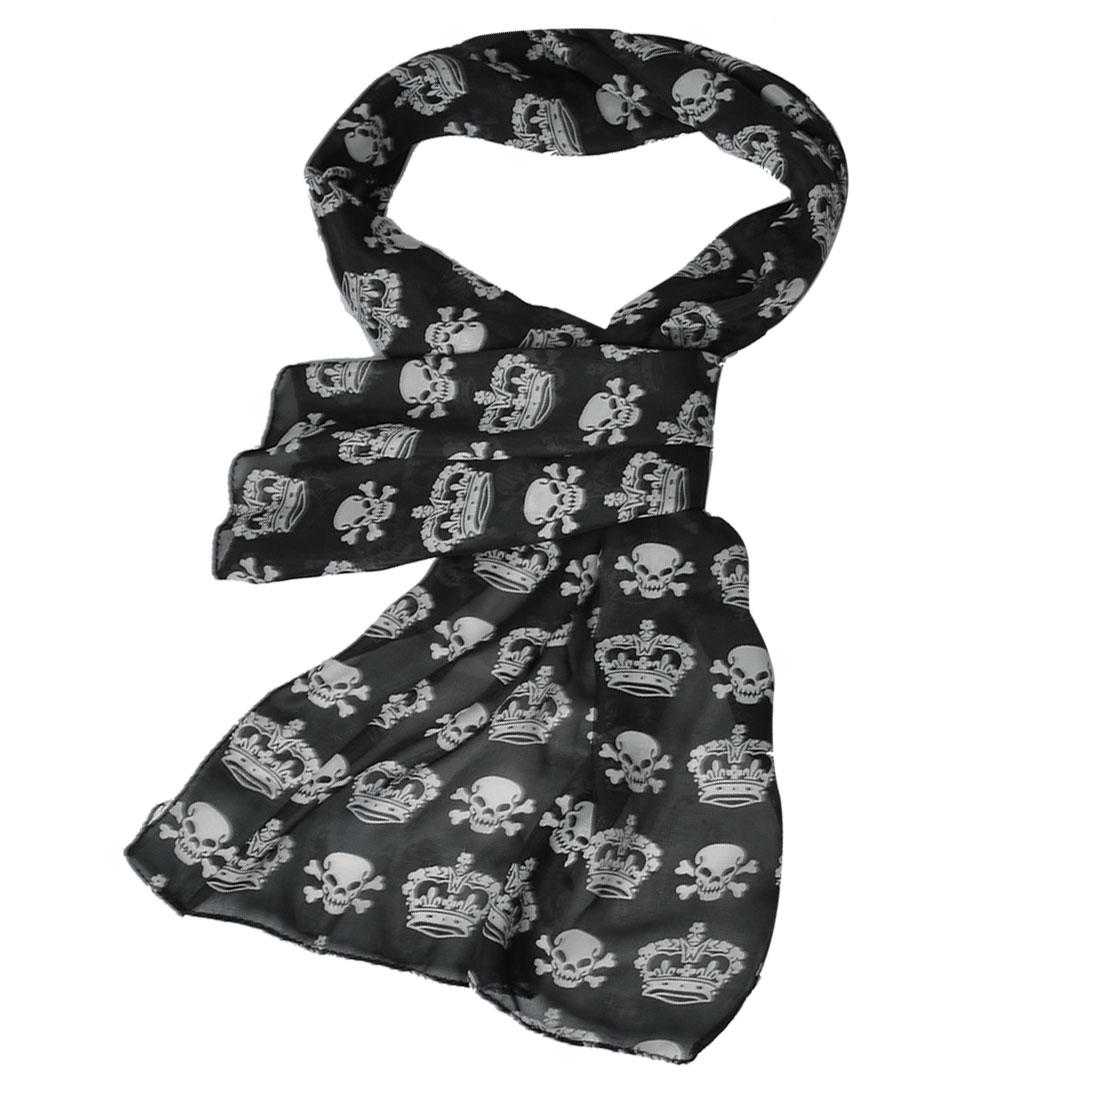 Lady White Crown Skull Prints Rectangle Shaped Chiffon Long Scarf Shawl Black